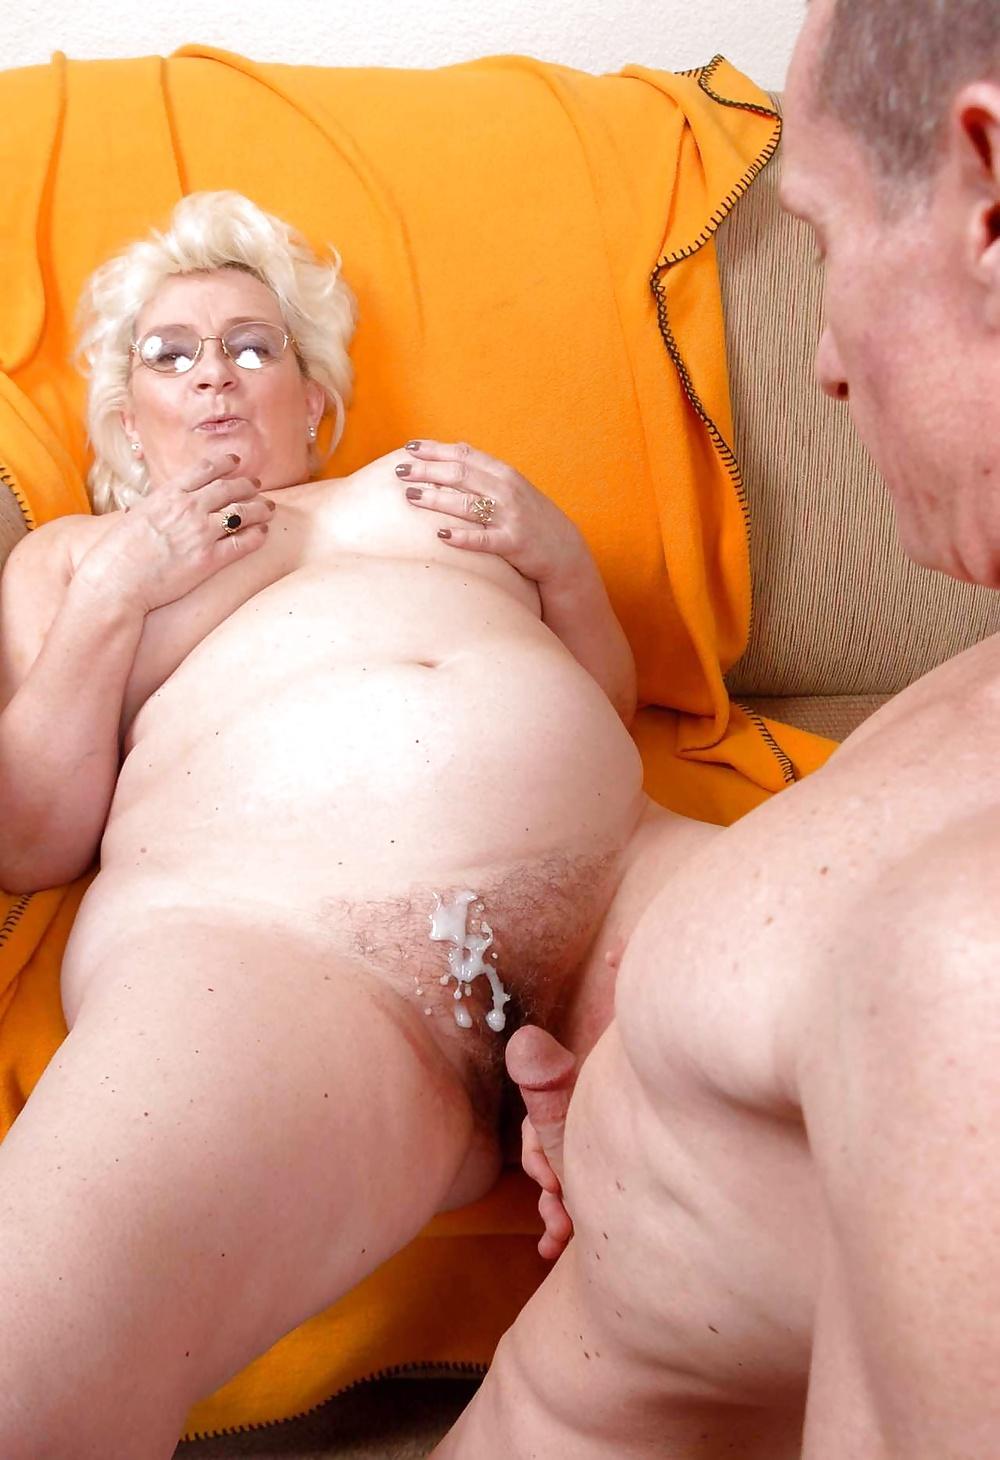 Amateur Matures Grannies Bbw Big Boobs Big Ass 14 - 23 -3957